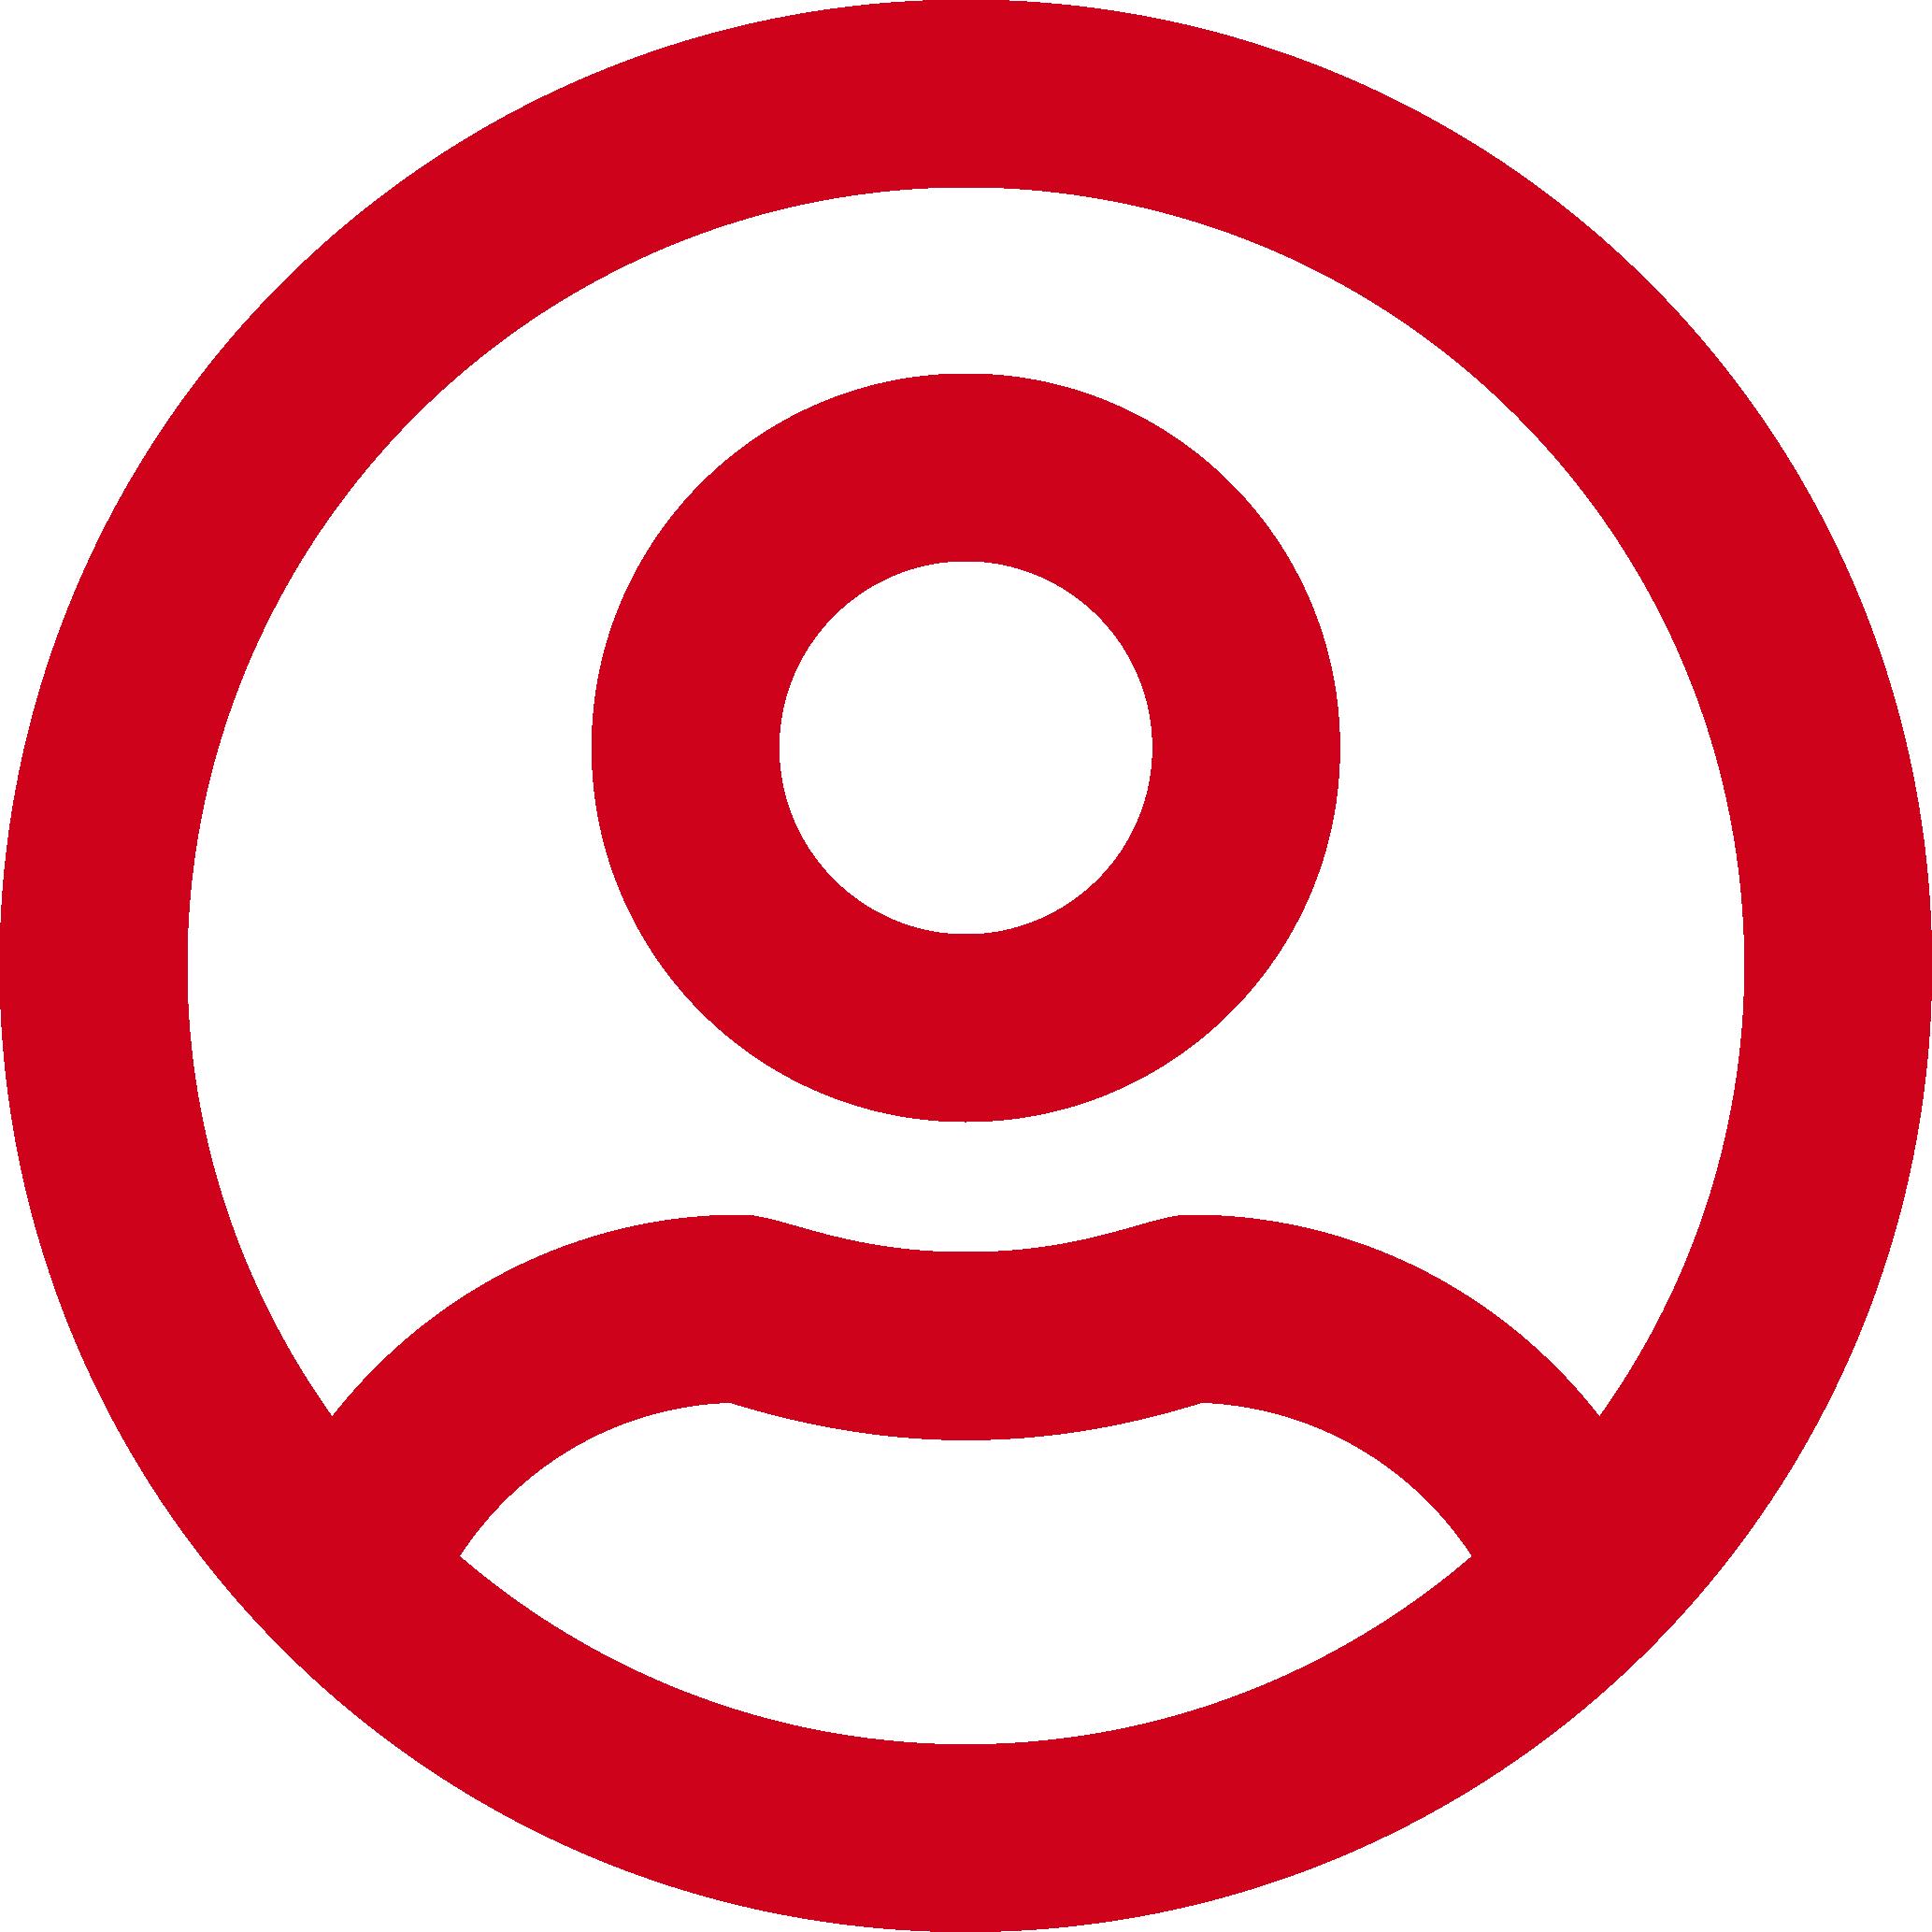 user-circle-regular.png